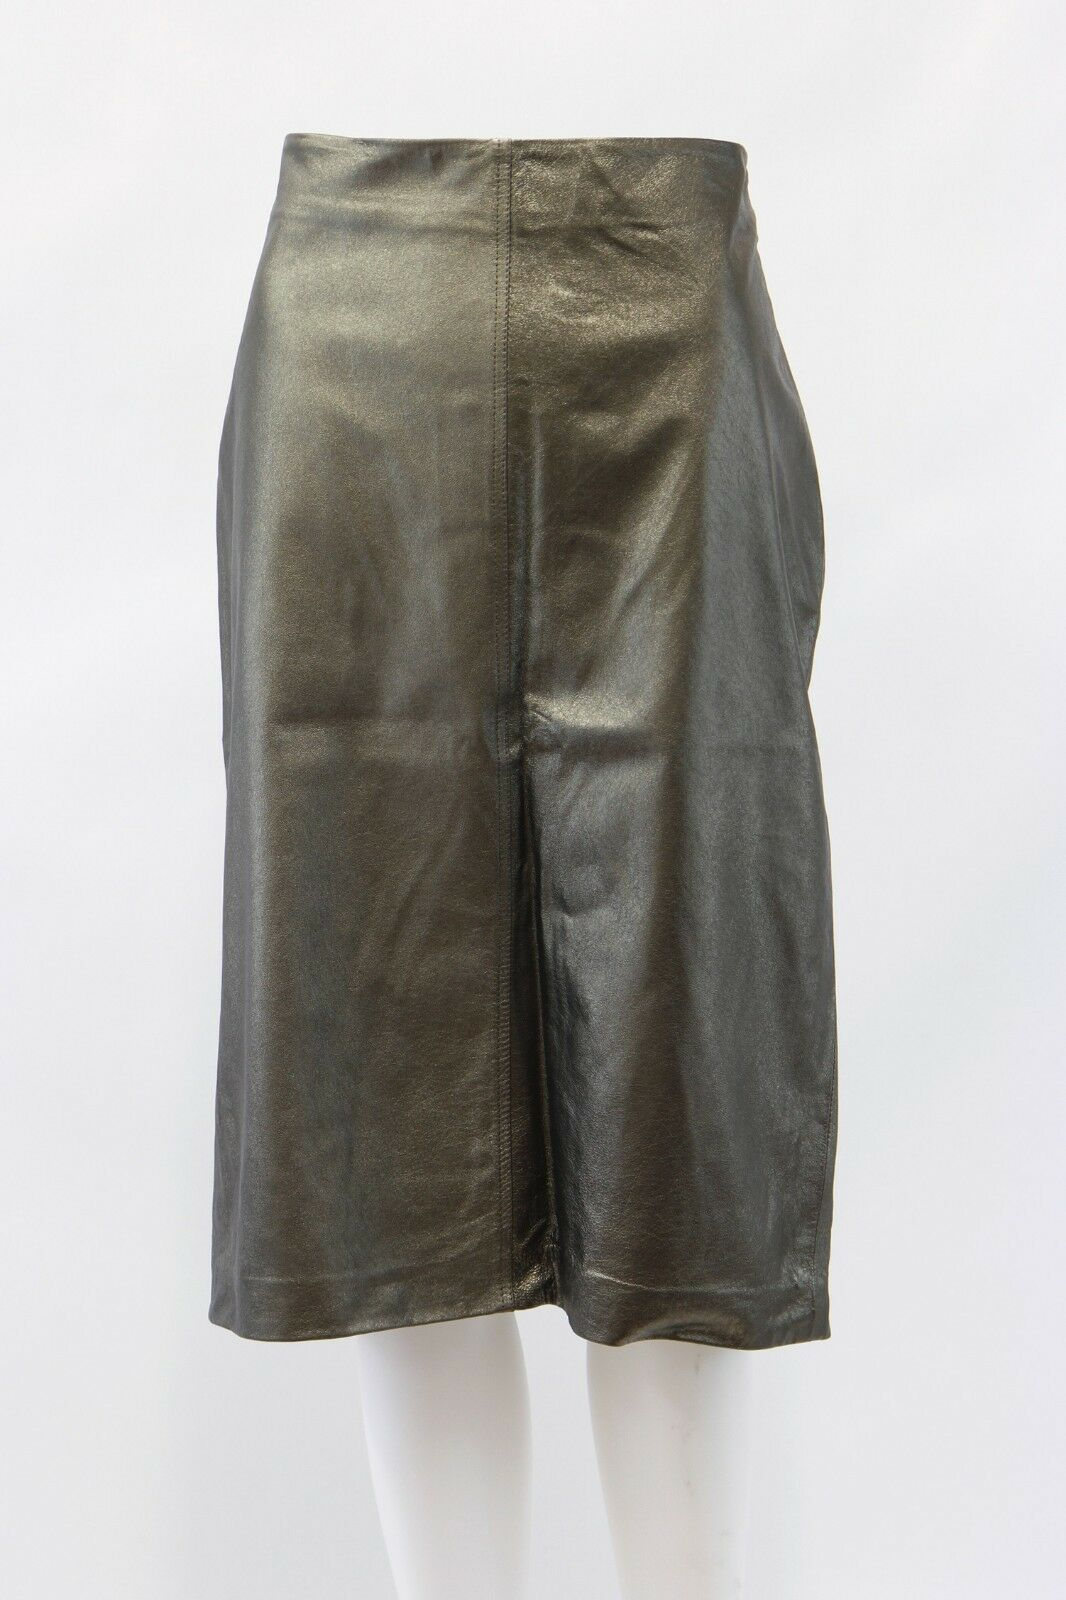 NWT 2695 Brunello Cucinelli 100% Leather Metallic Pencil Skirt Größe 44  8US A181